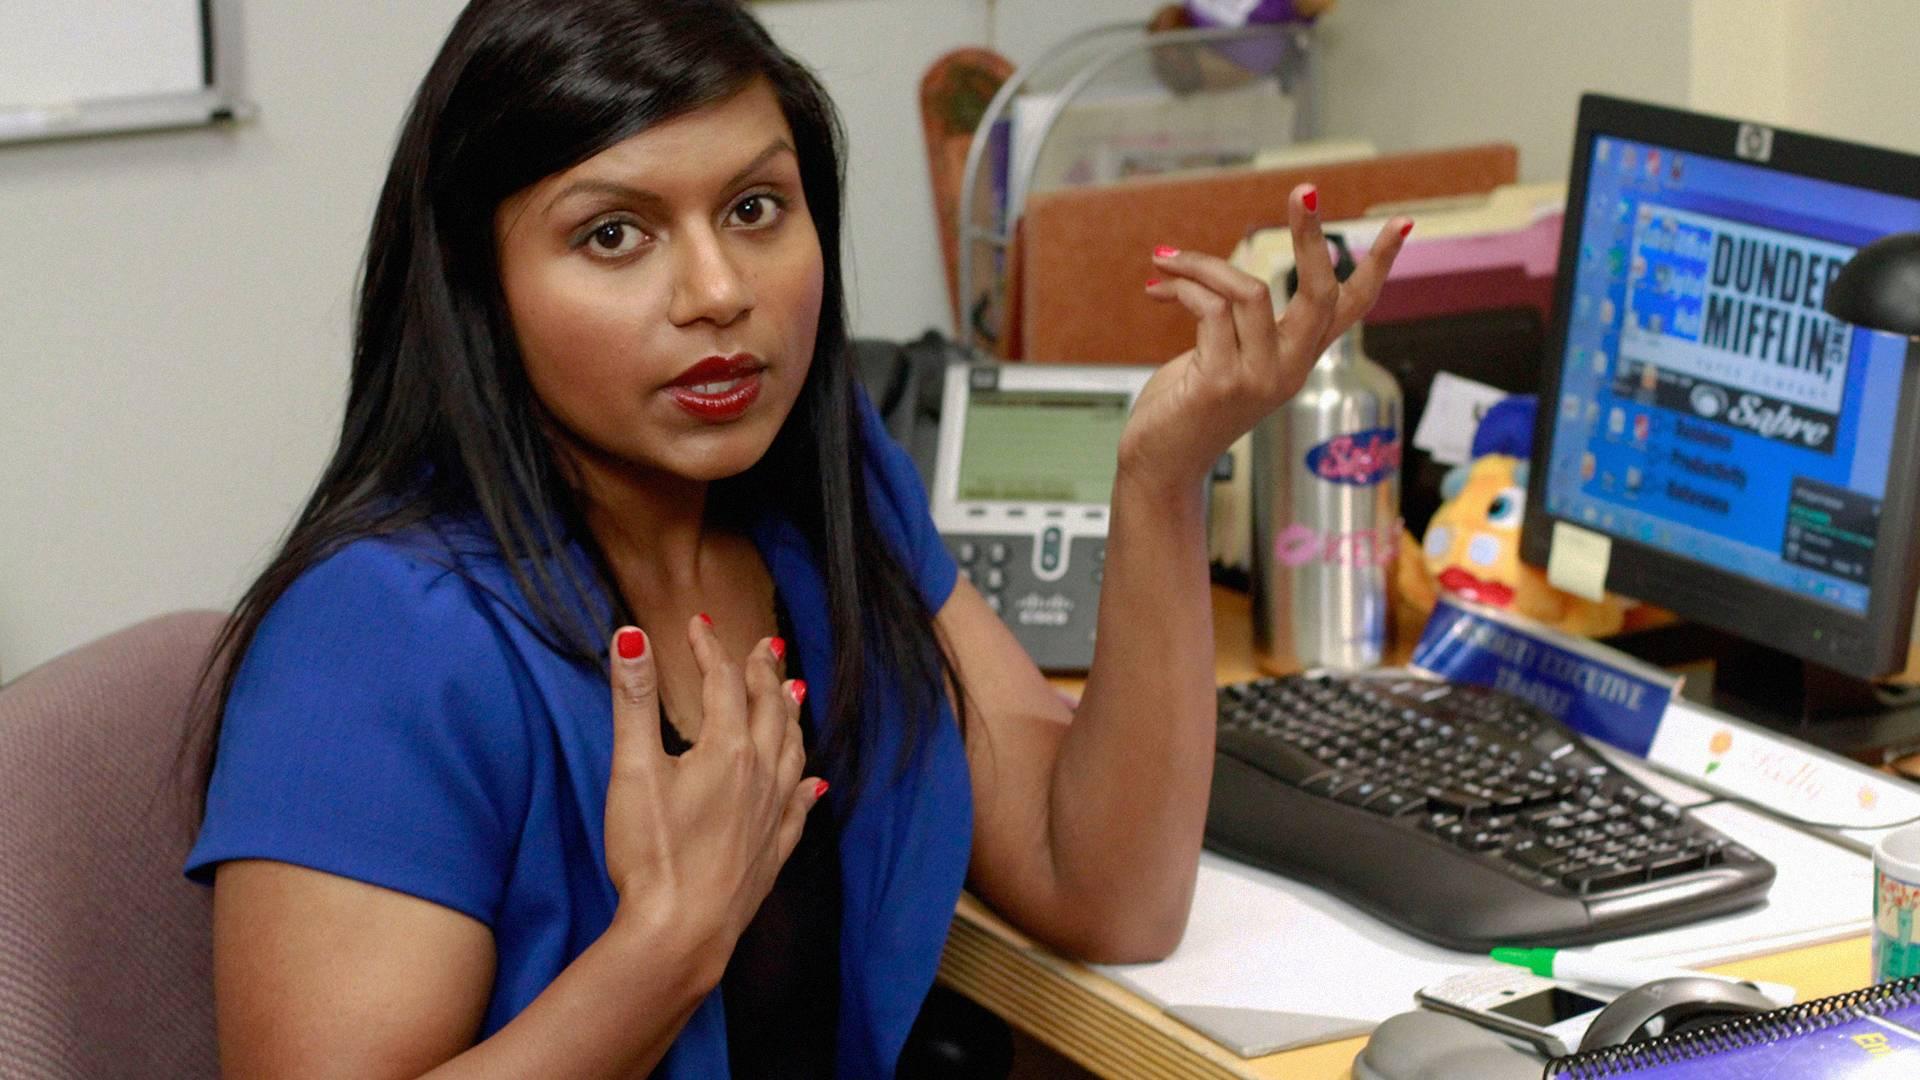 The Office Season 8 Episode 2